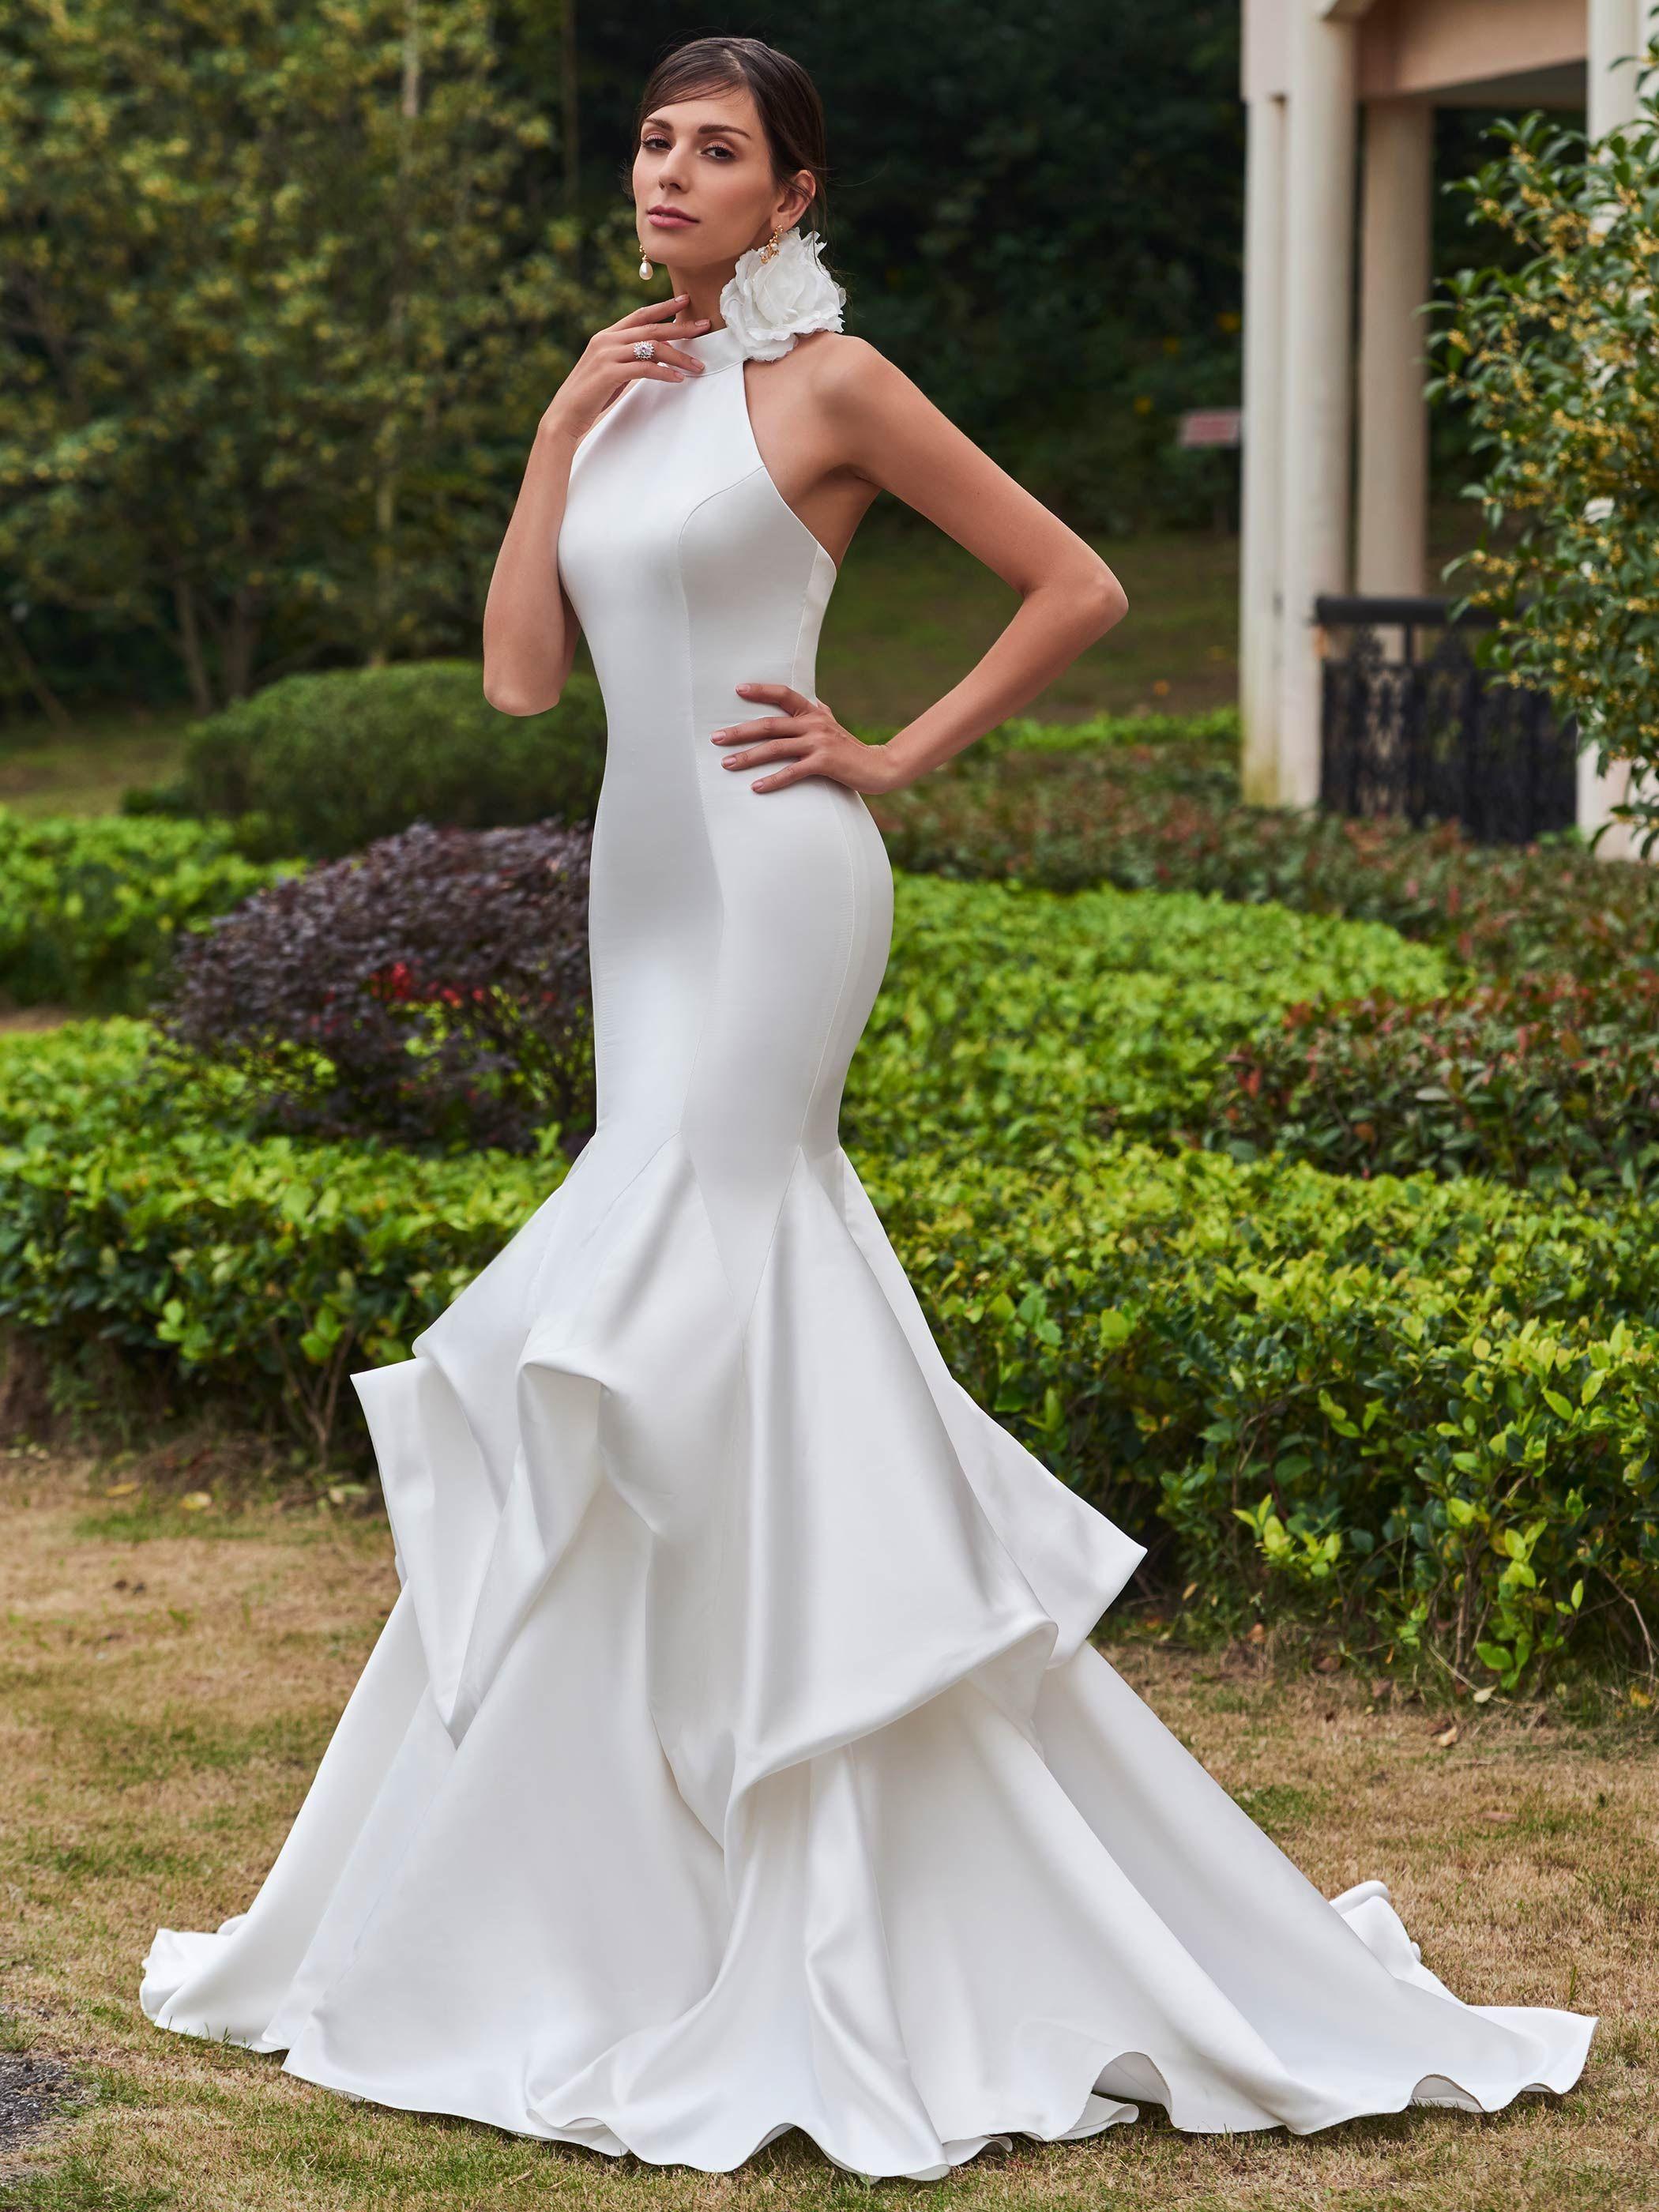 Vintage high neck zipperup mermaid wedding dress gorgeous wedding